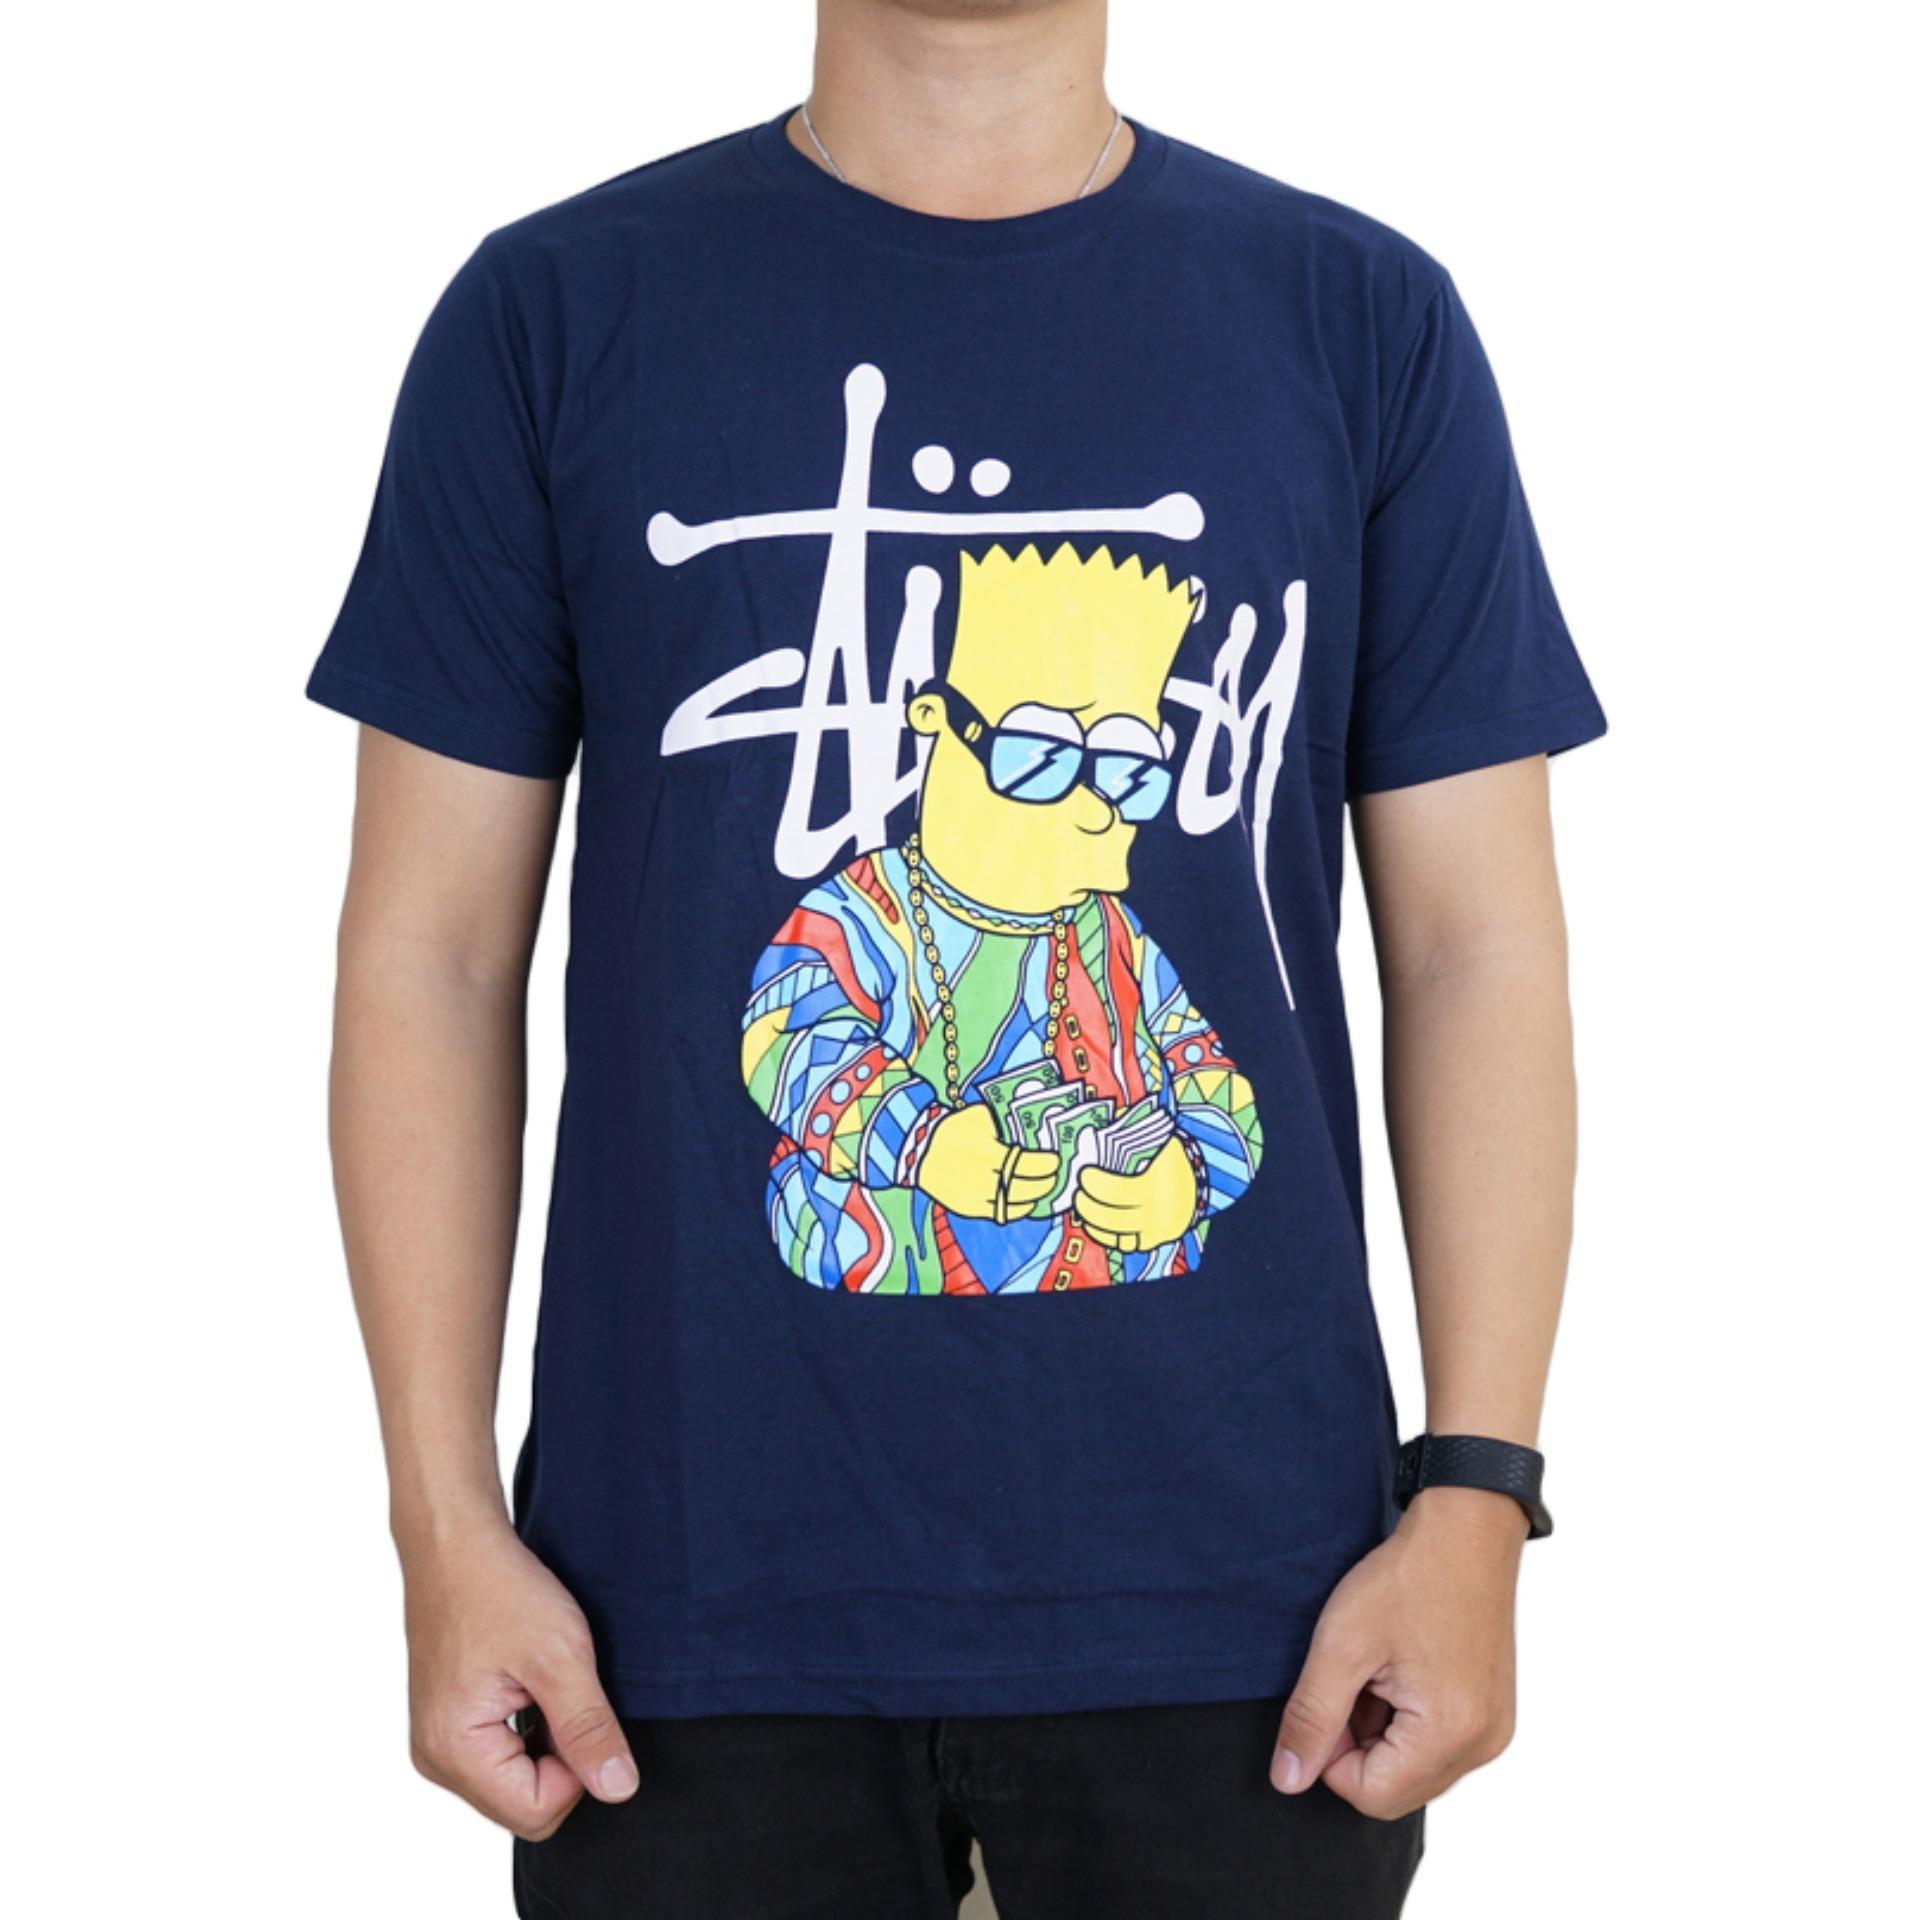 Buy Sell Cheapest Sarung Bantal Hiphop Best Quality Product Deals Kaos Jabbawockeez Vanwin T Shirt Distro Pria Tshirt